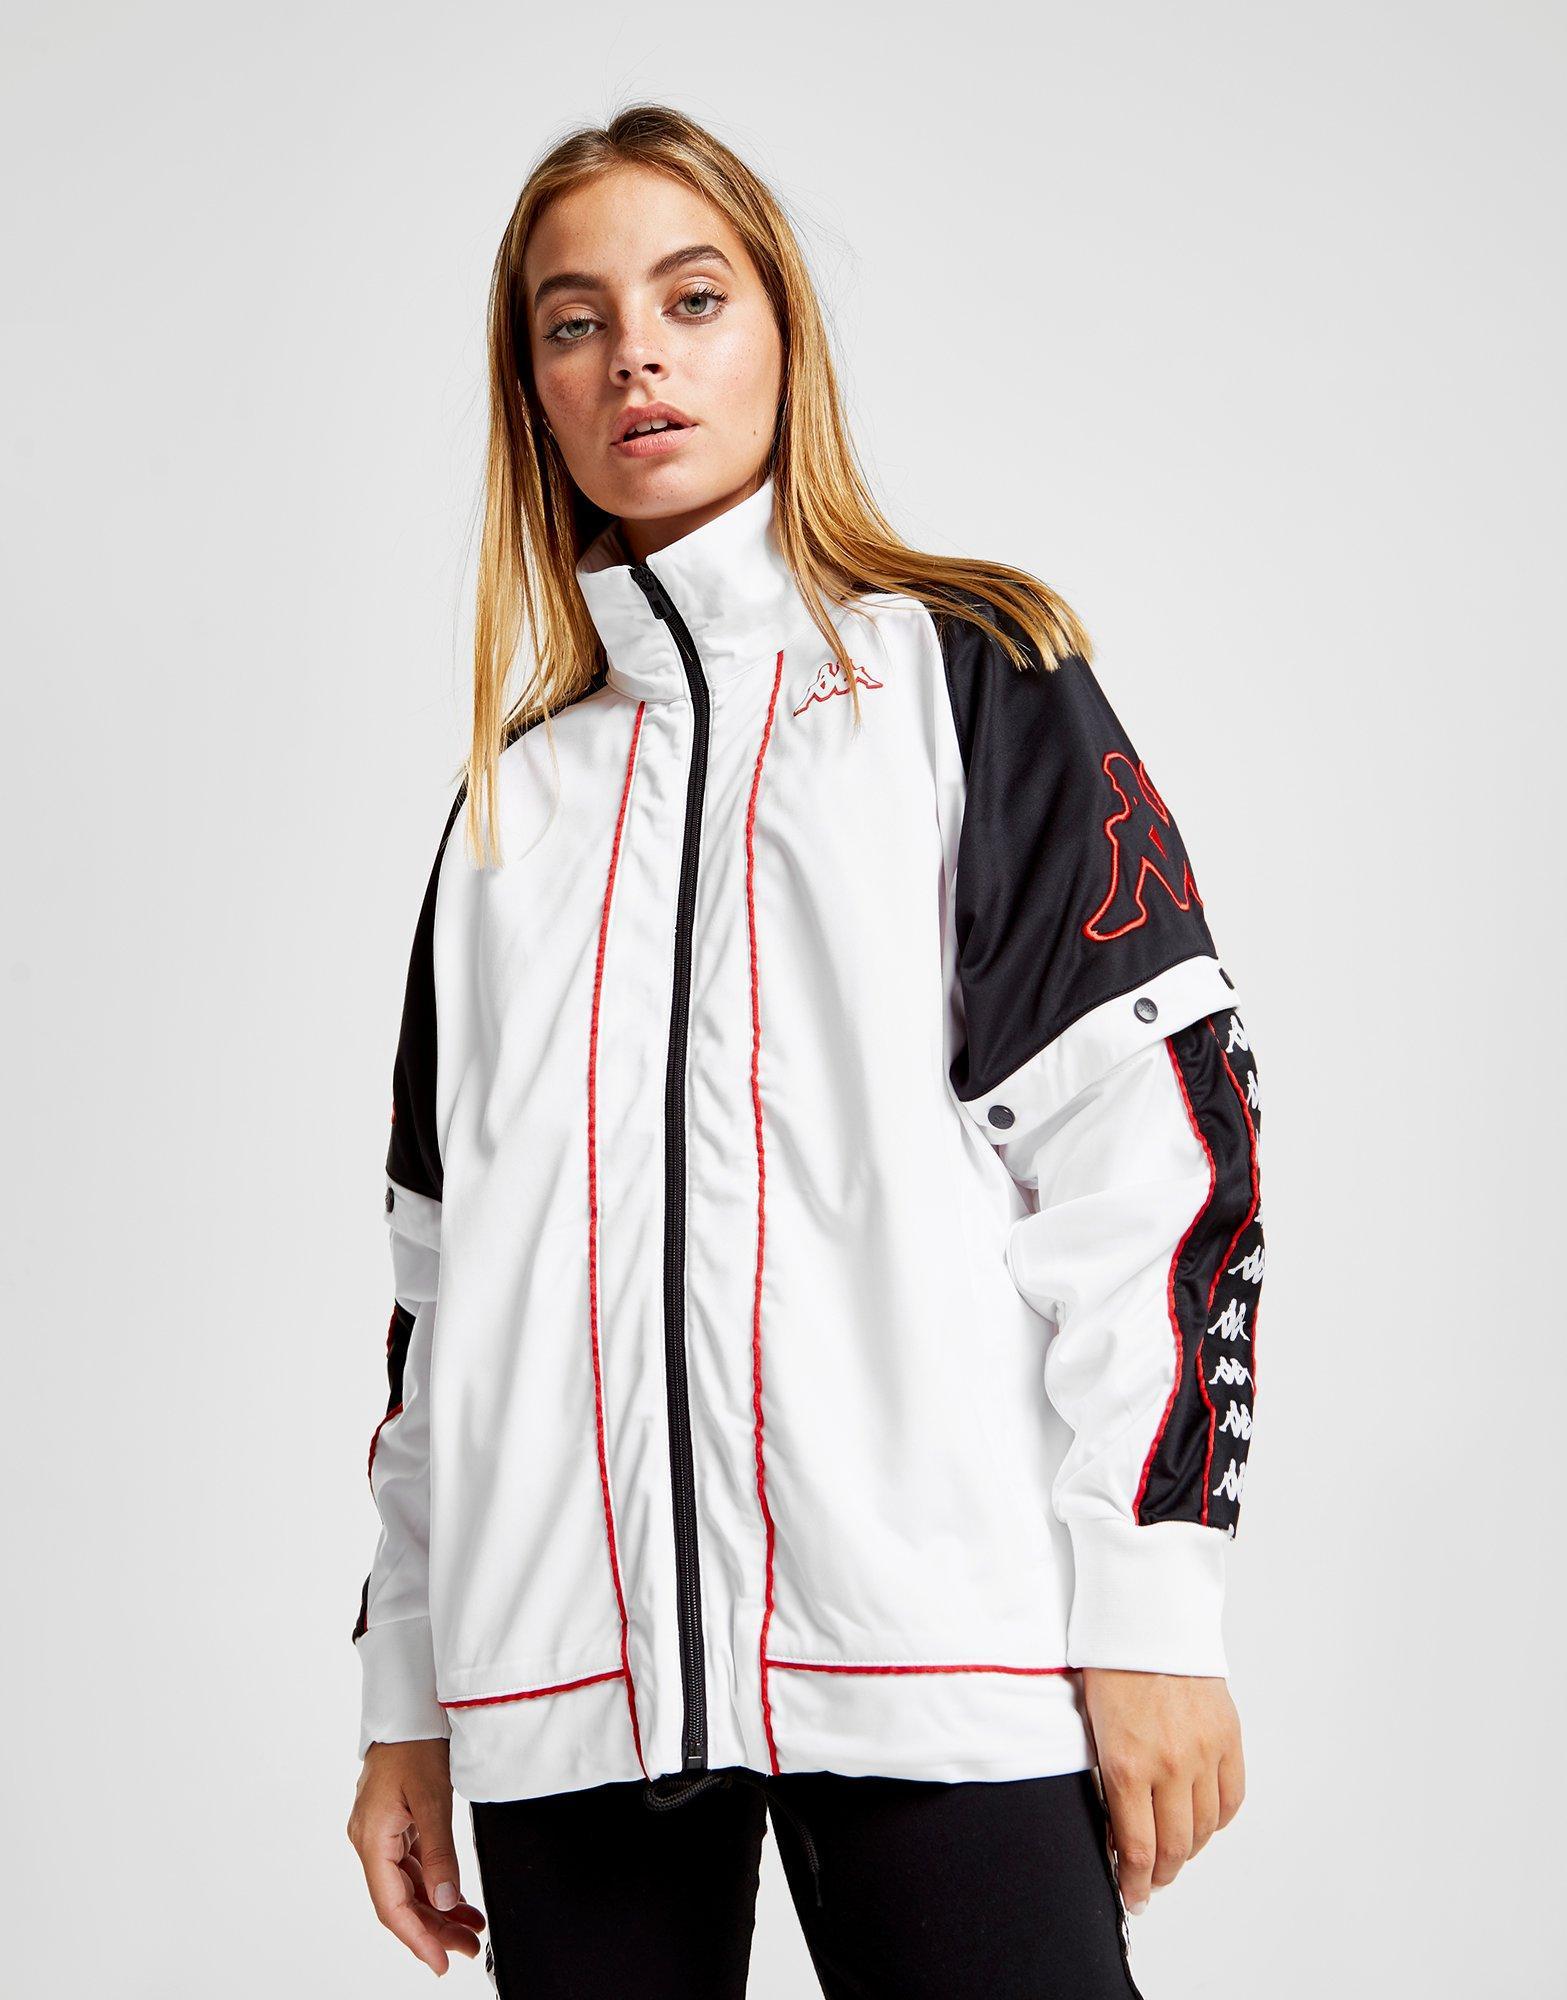 e68667939d6e Lyst - Kappa Panel Popper Jacket in White